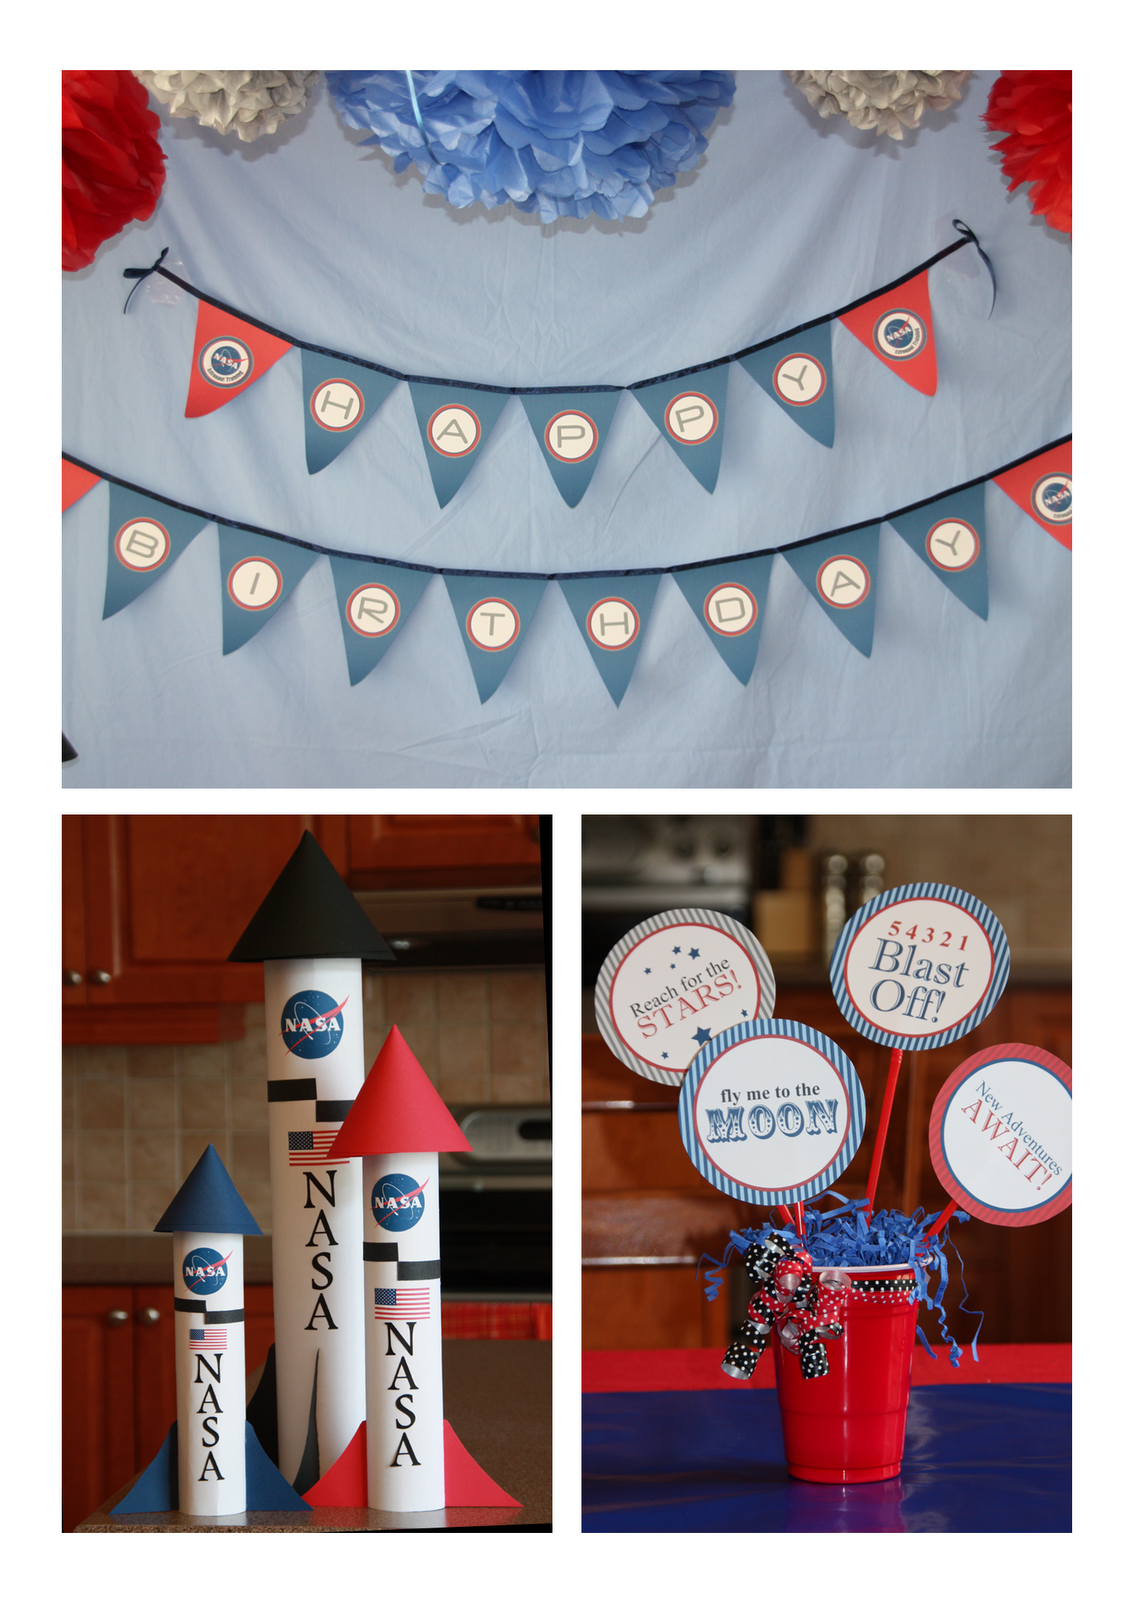 NASA Astronaut Training Printable Decorations Space Party - Astronaut decorations